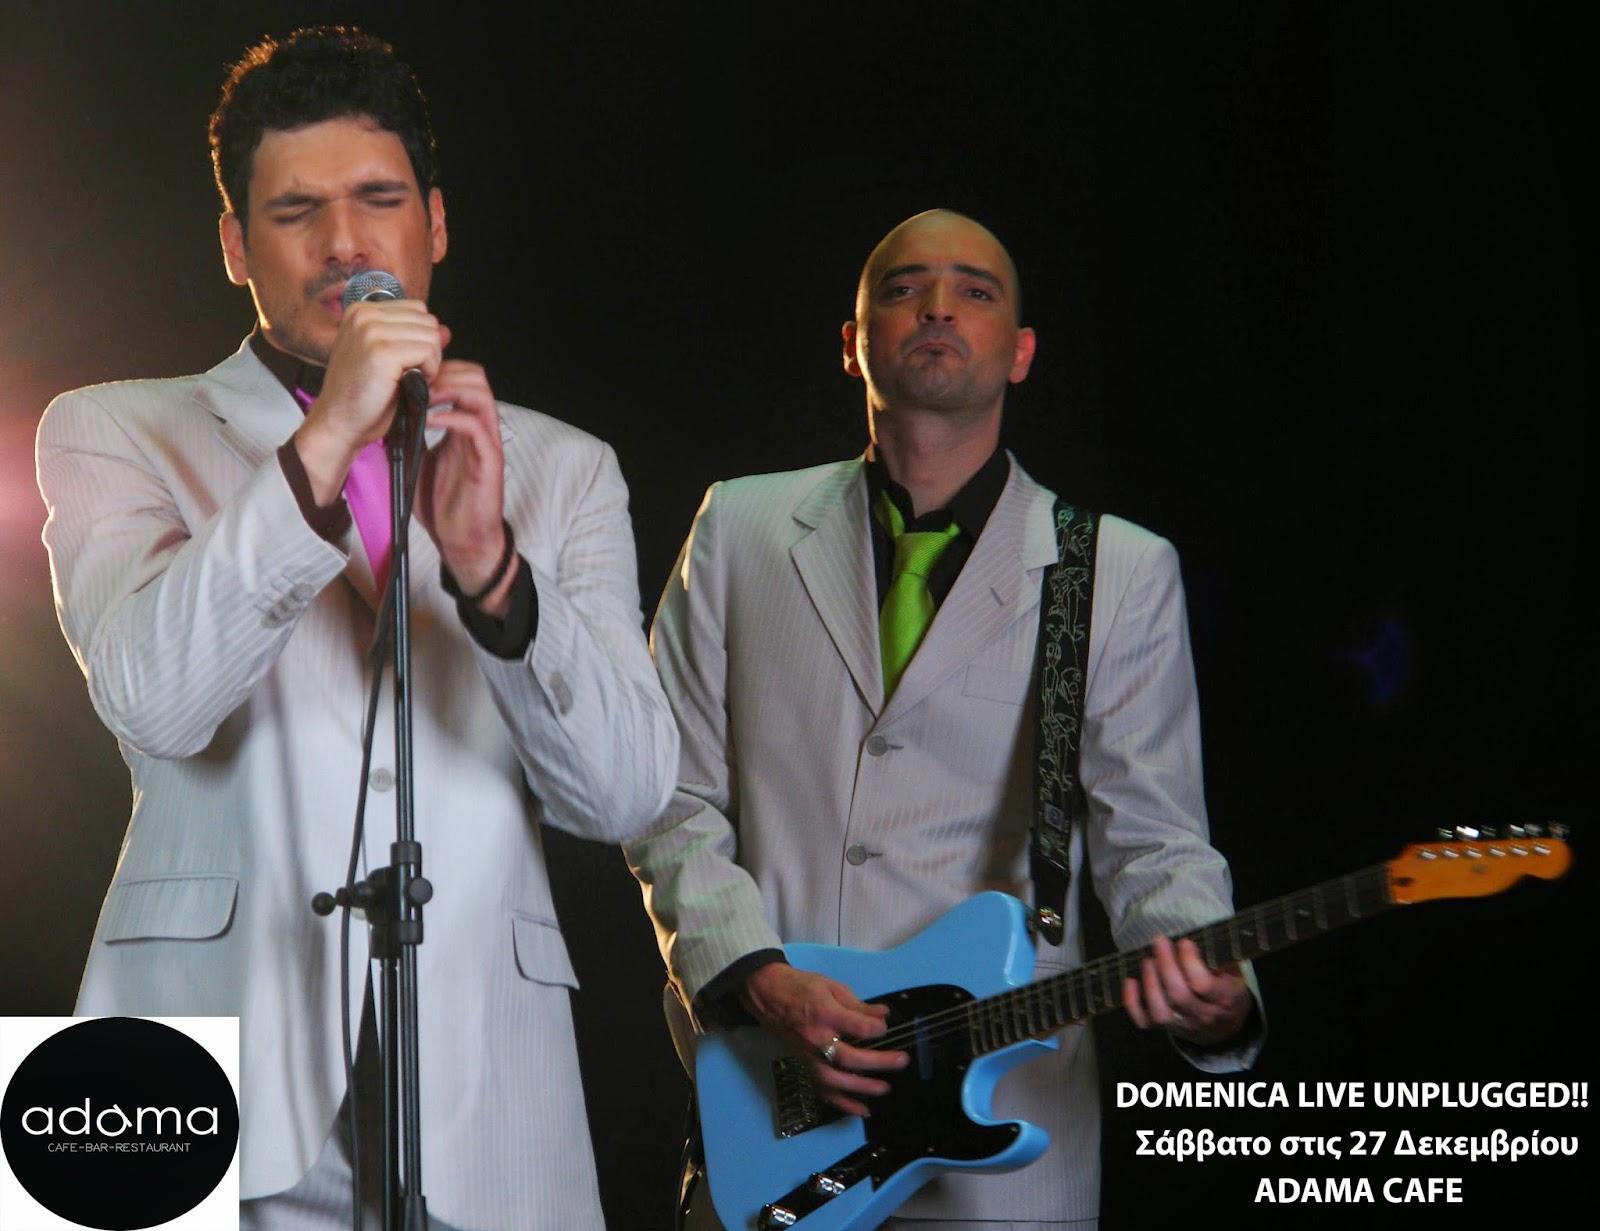 domenica-live-unplugged-adama-cafe